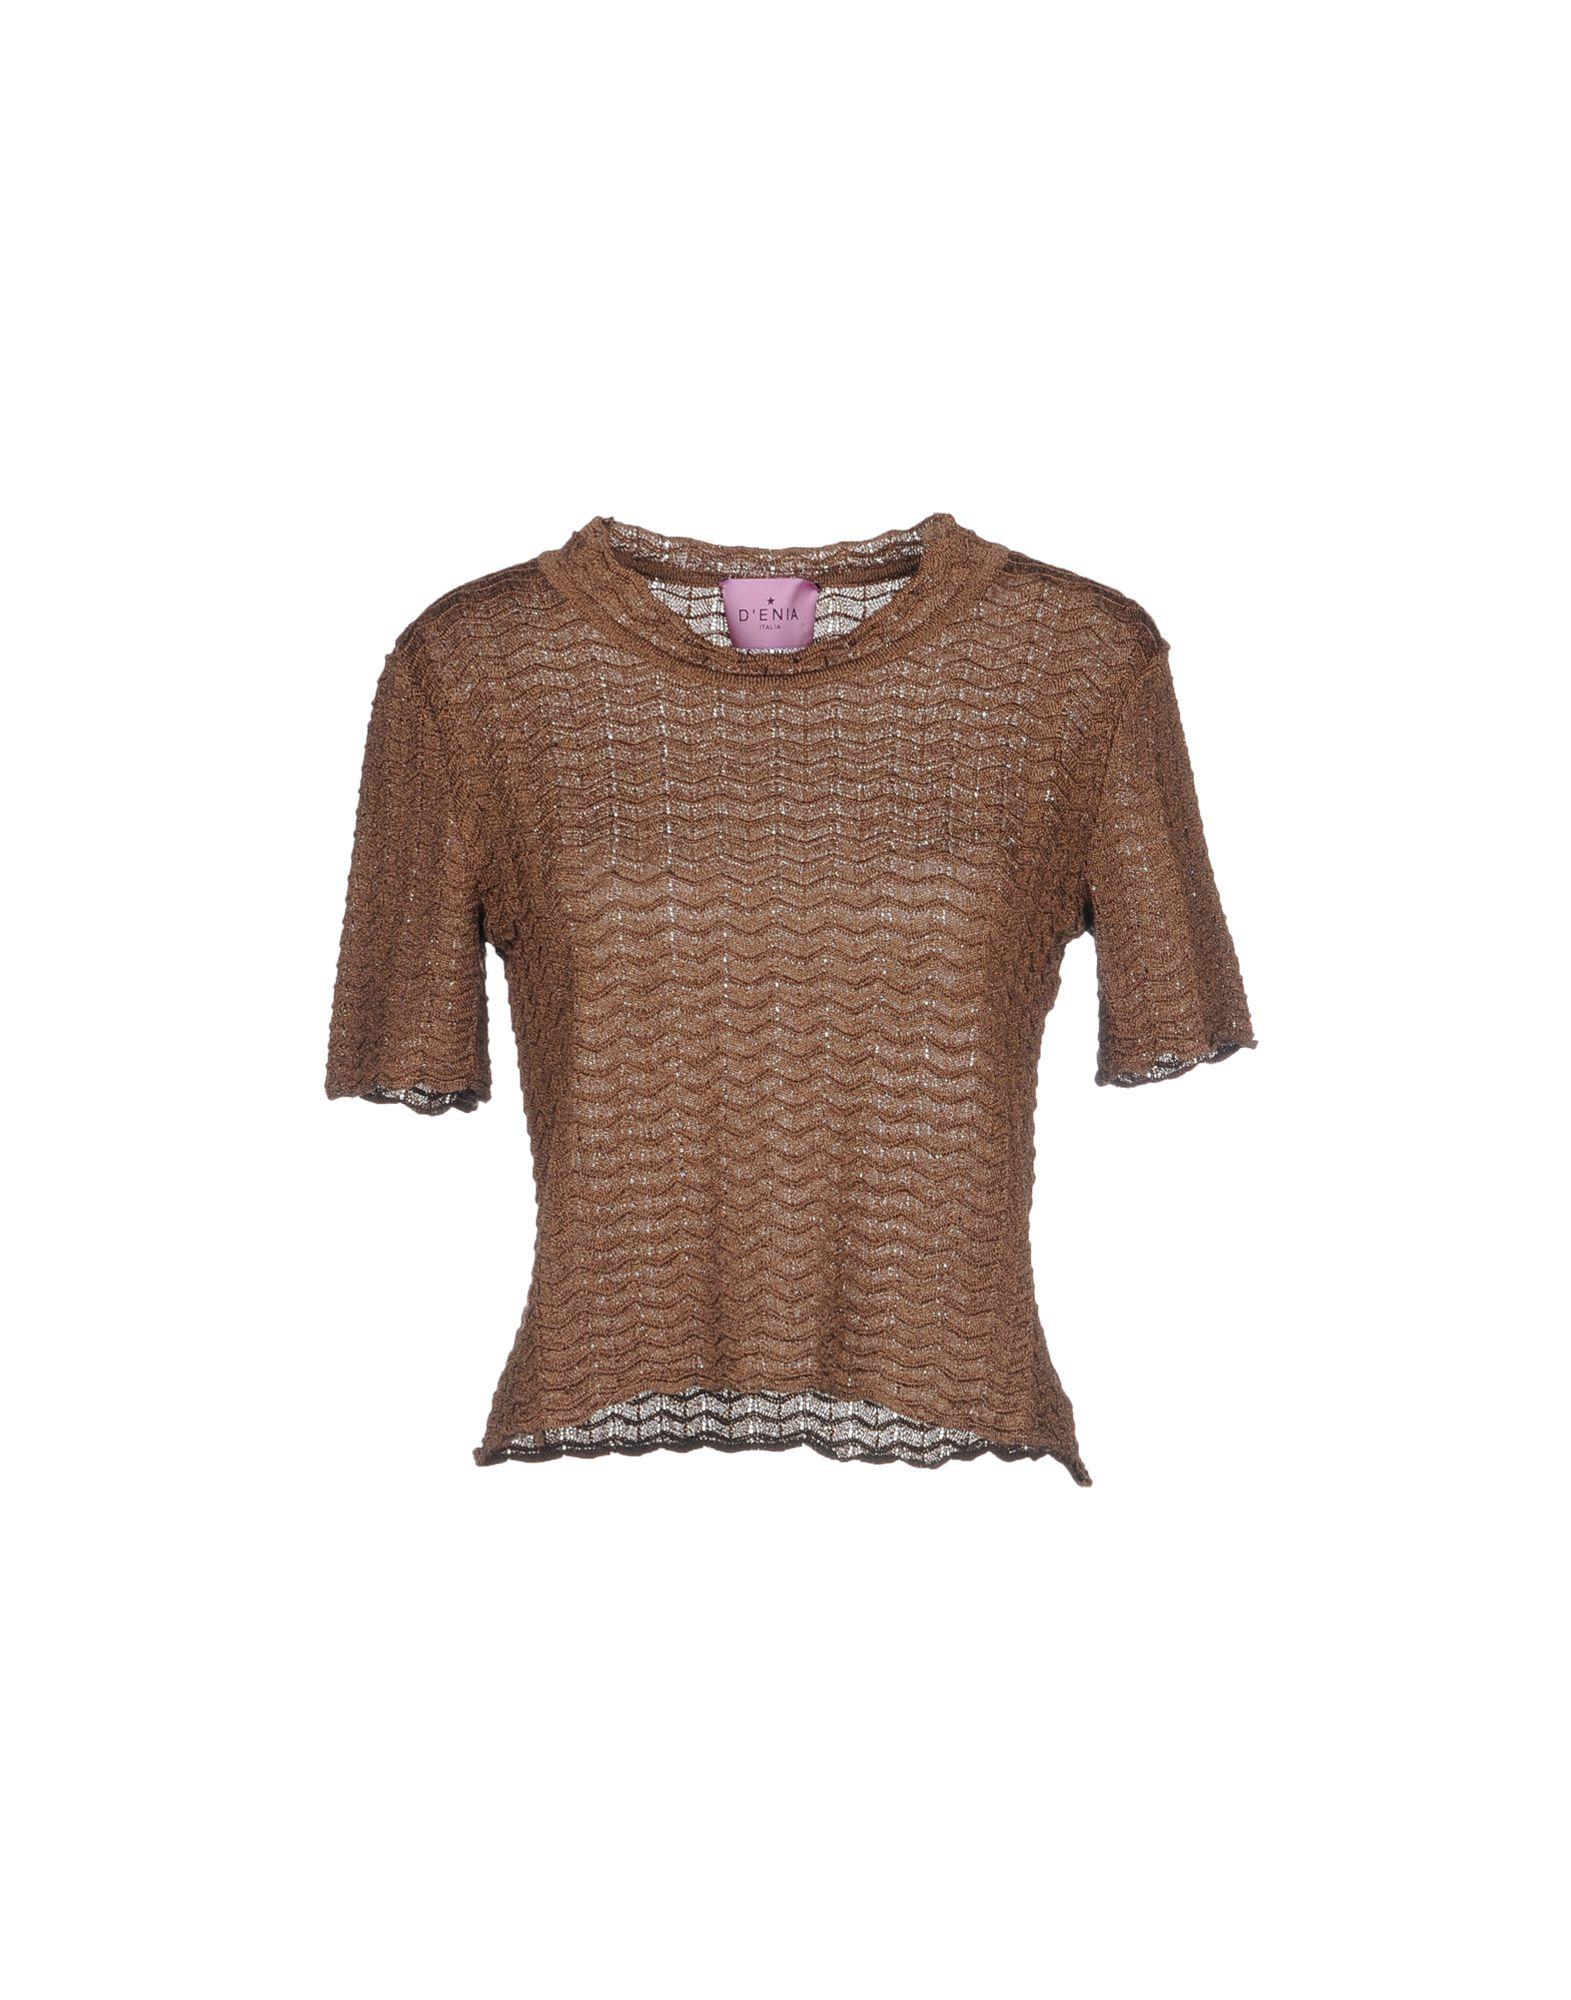 D'ENIA Sweater in Brown